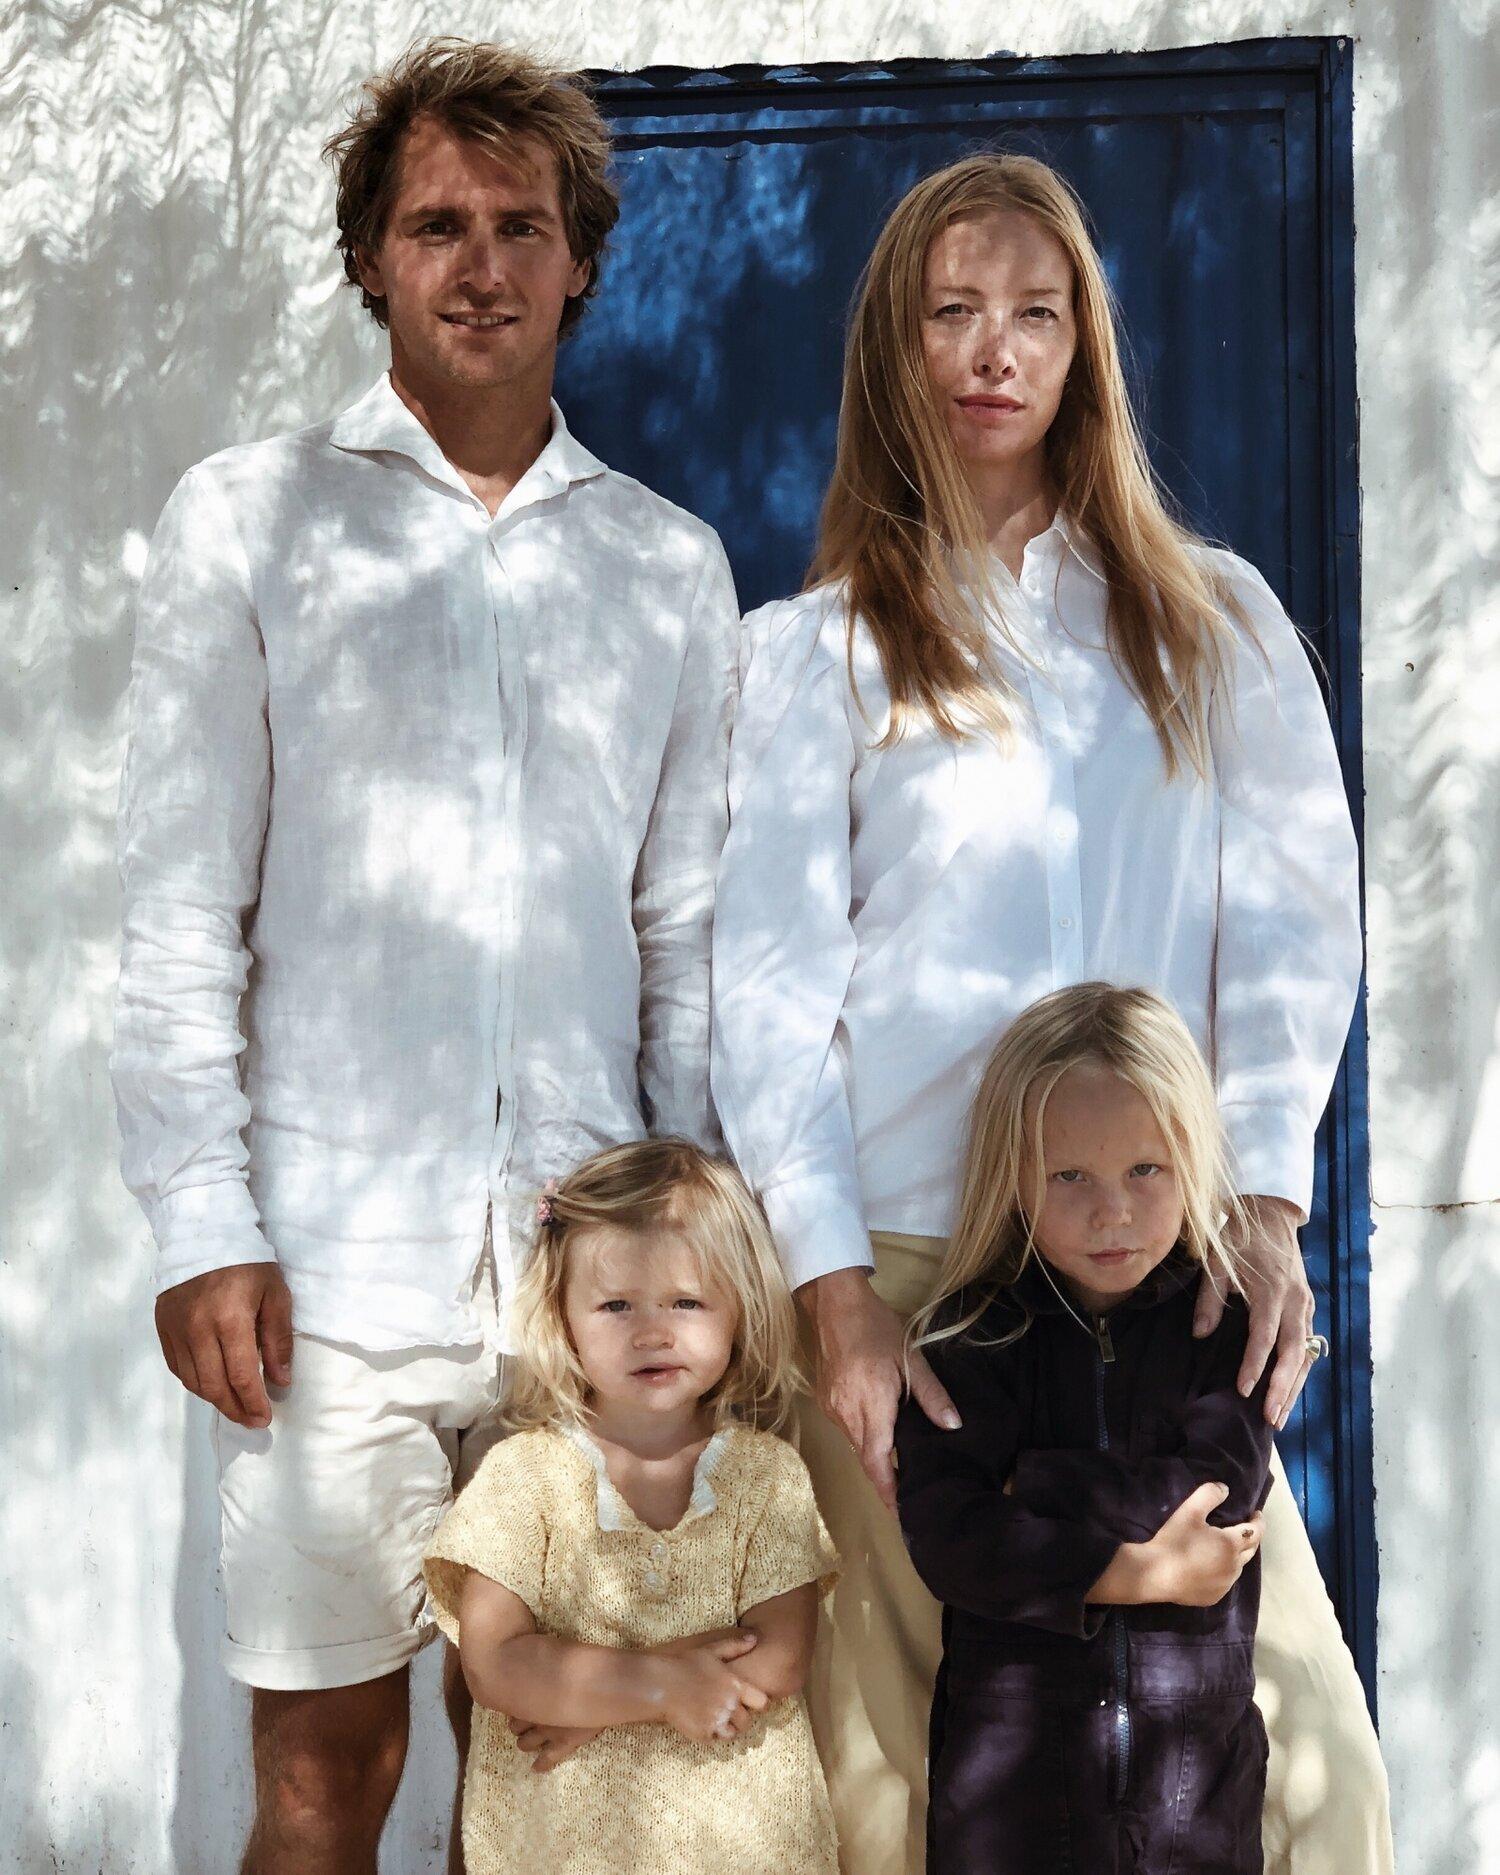 leoleofamily_leoleocopenhagen.jpeg